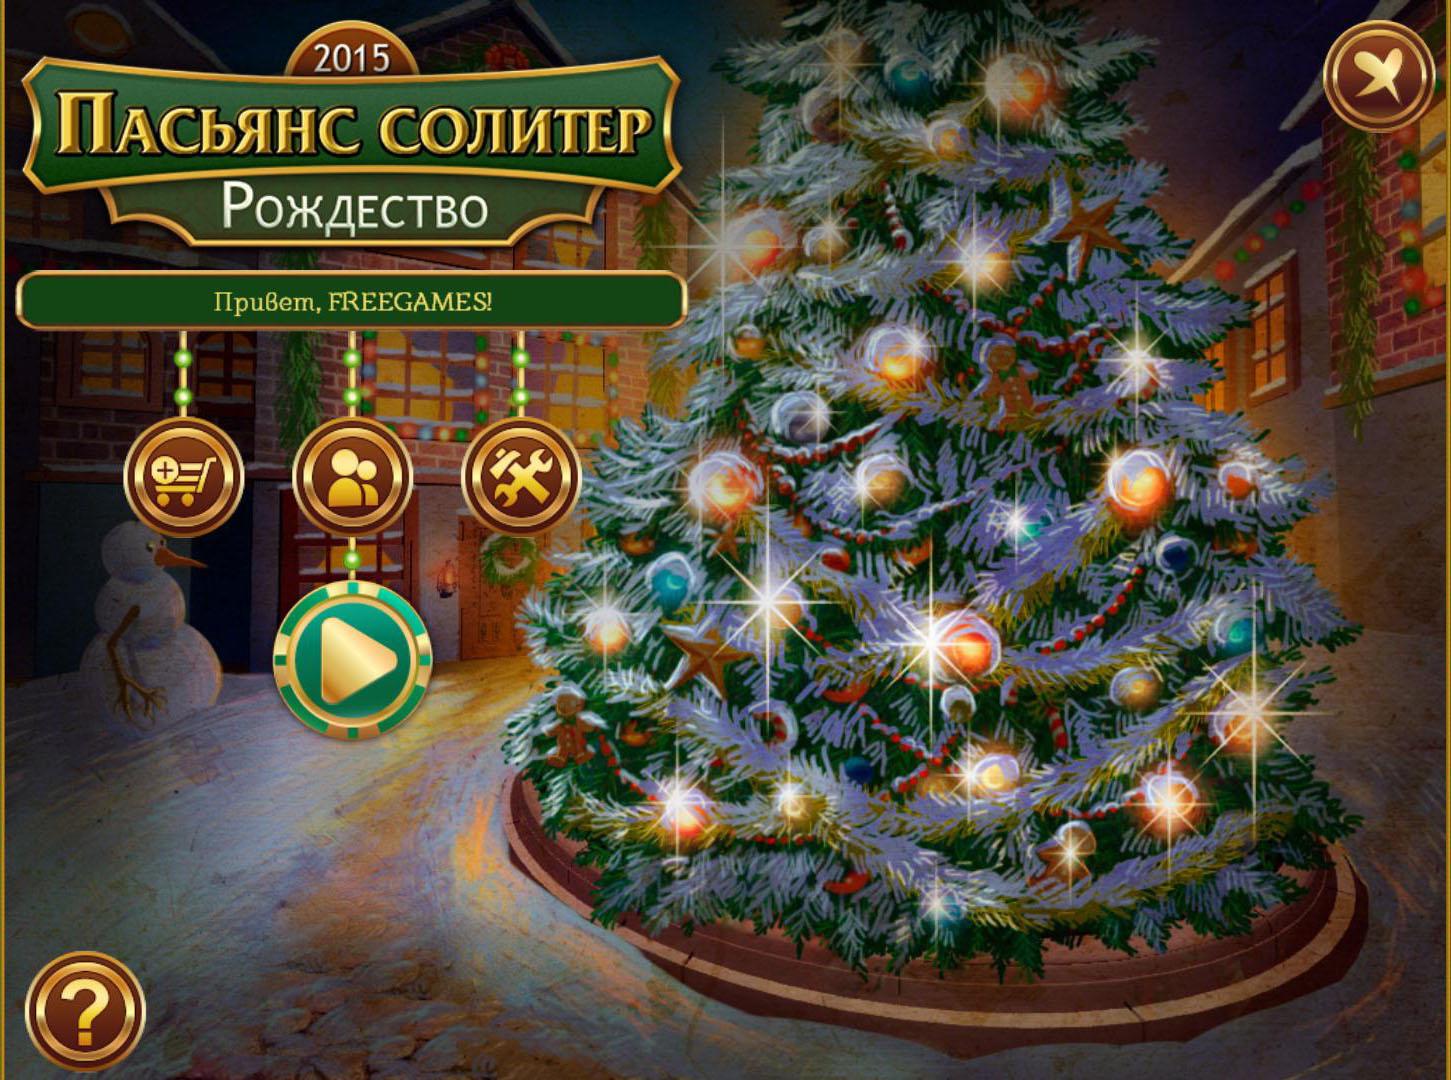 Пасьянс солитер. Рождество | Solitaire Game Christmas (Rus)